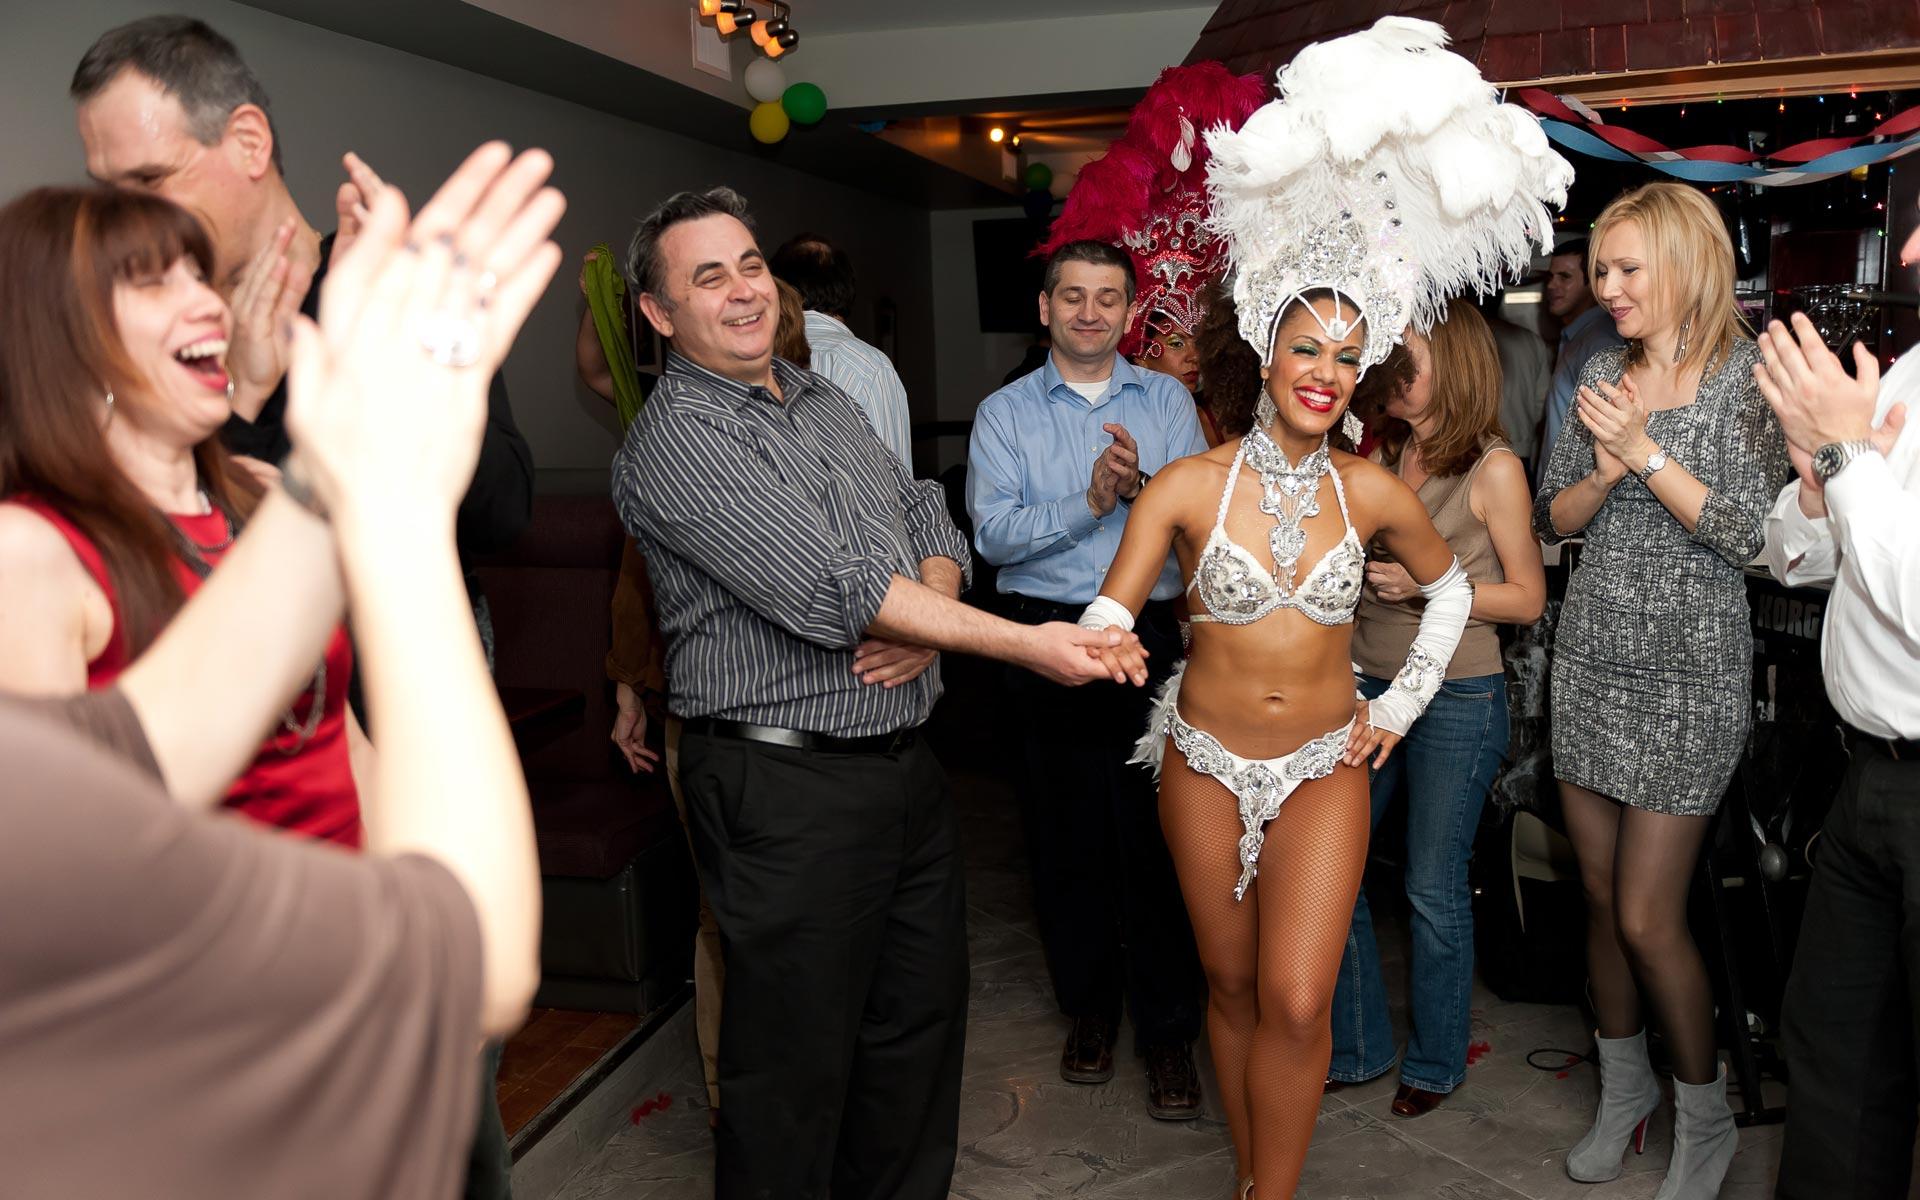 bkg-shows-cuban-salsa-samba-vegas-dancers-5